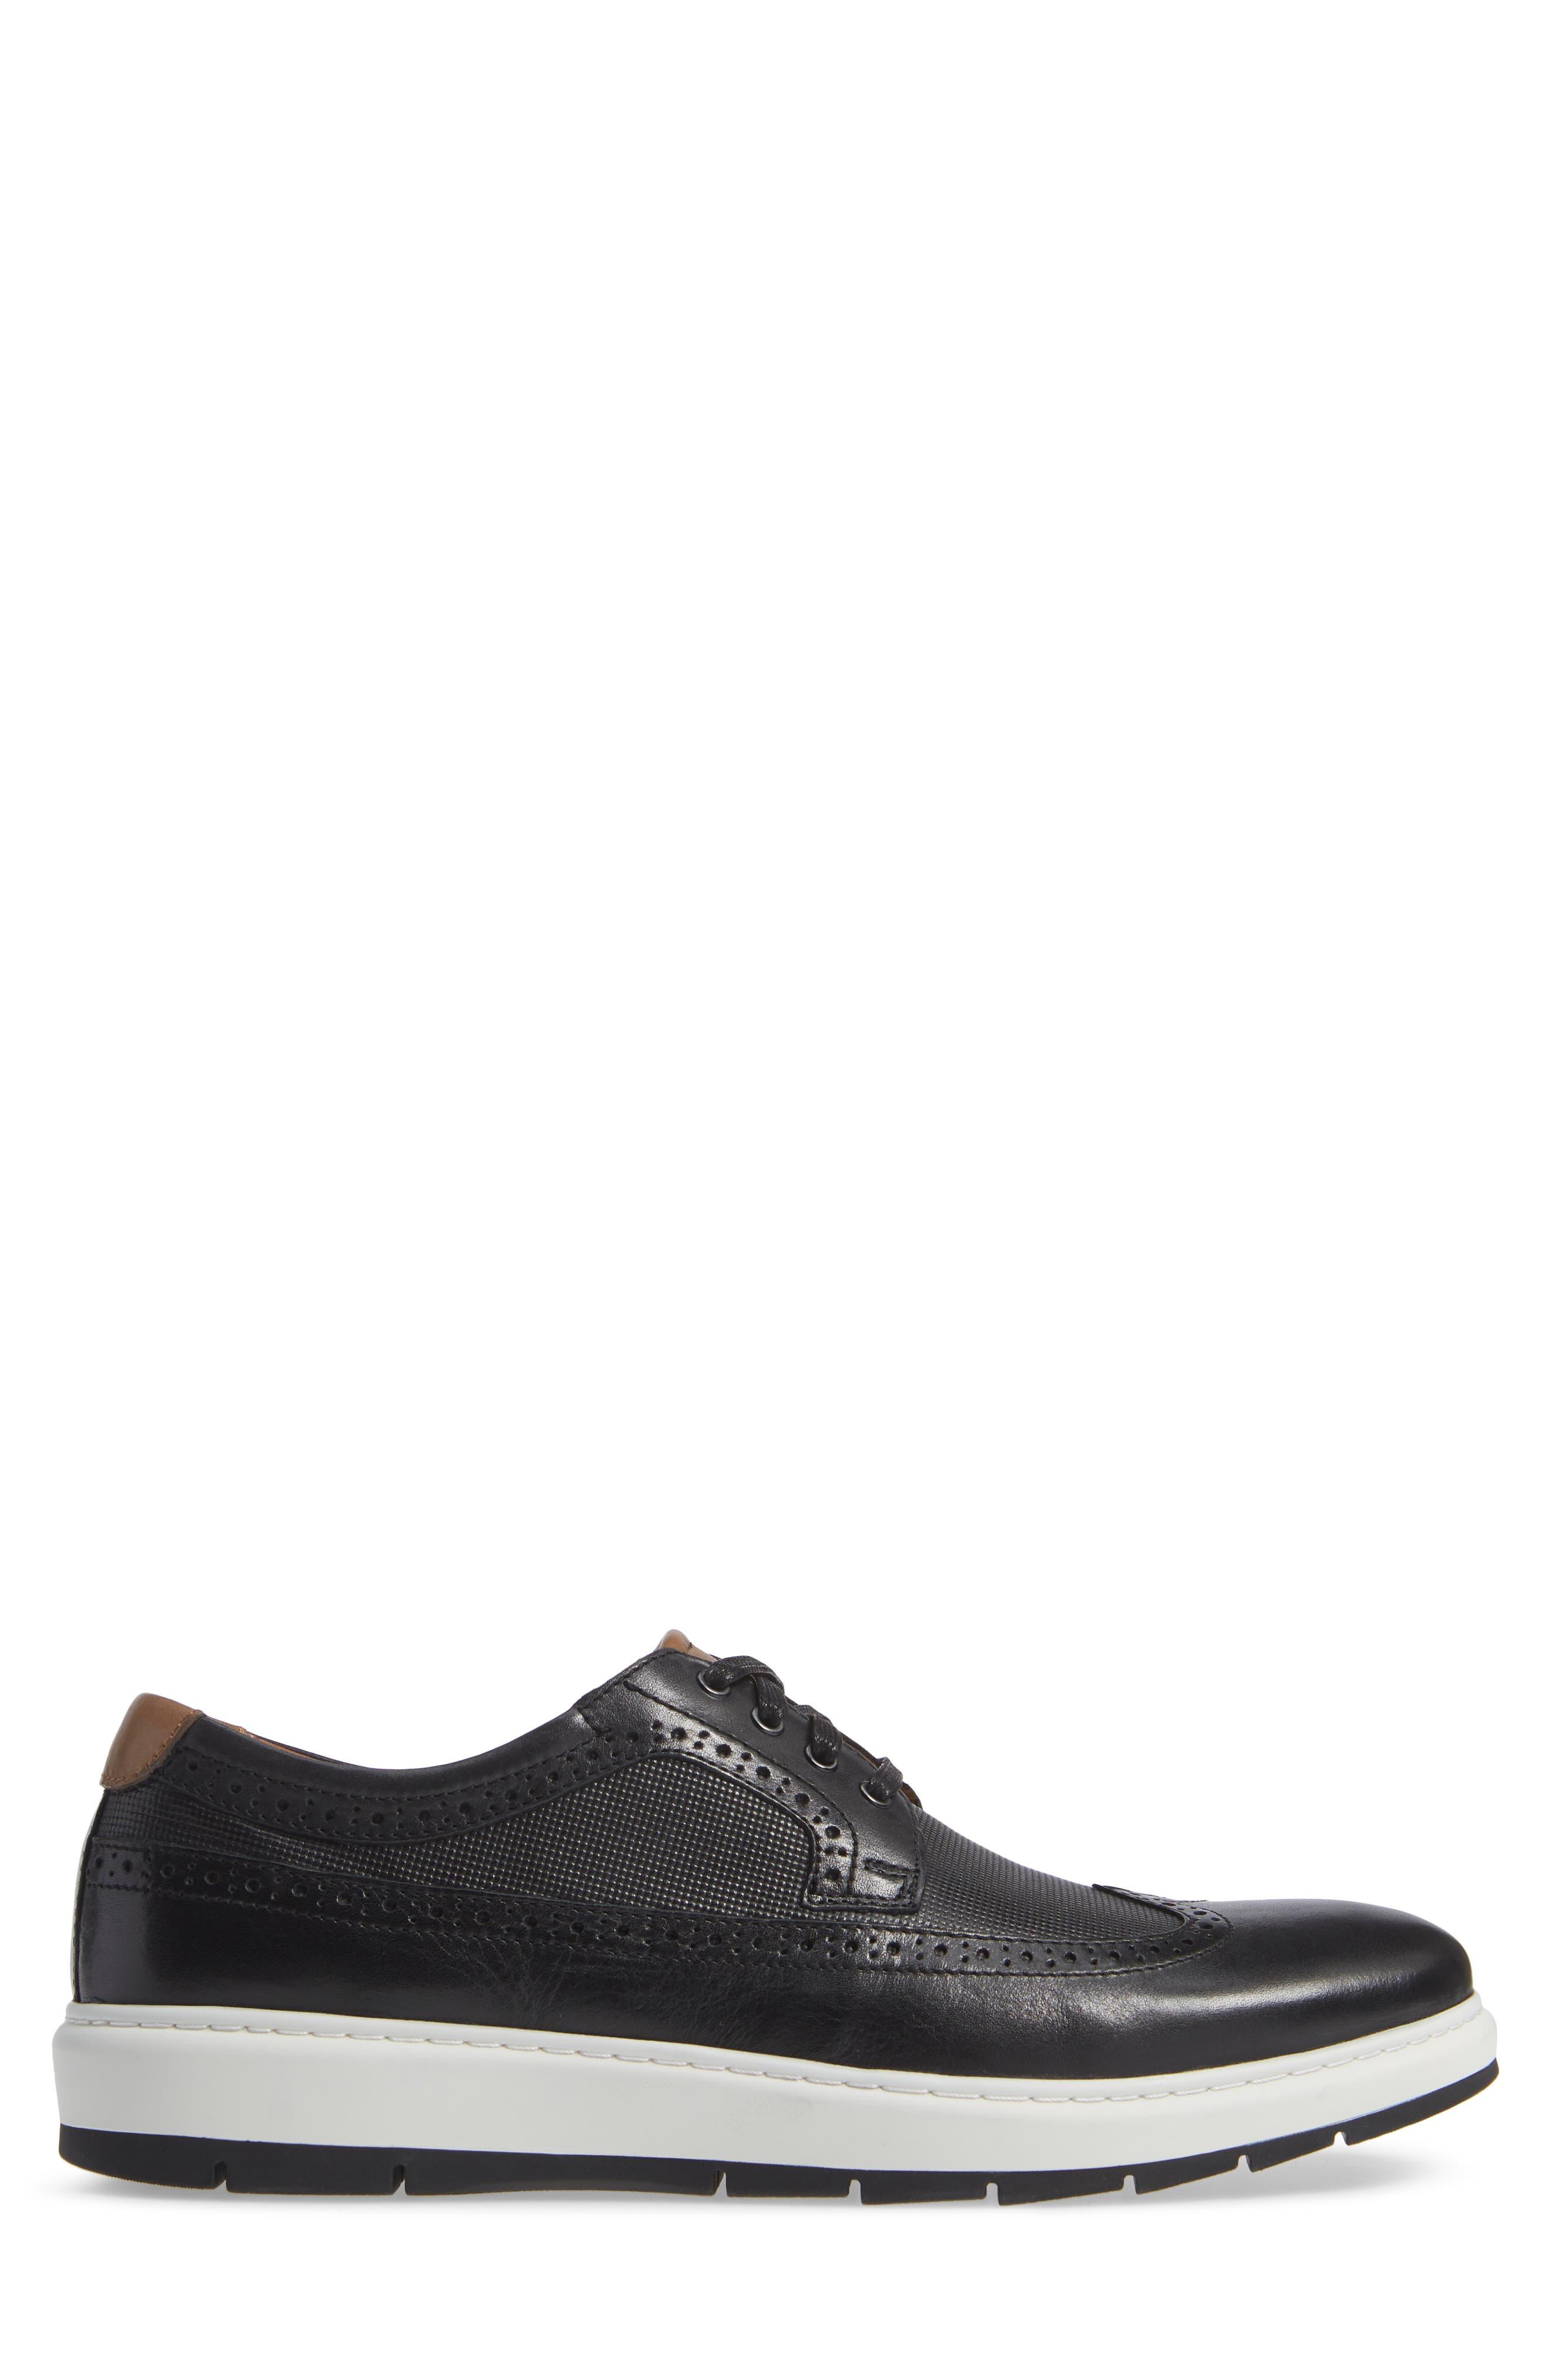 Elliston Wingtip Sneaker,                             Alternate thumbnail 3, color,                             BLACK LEATHER